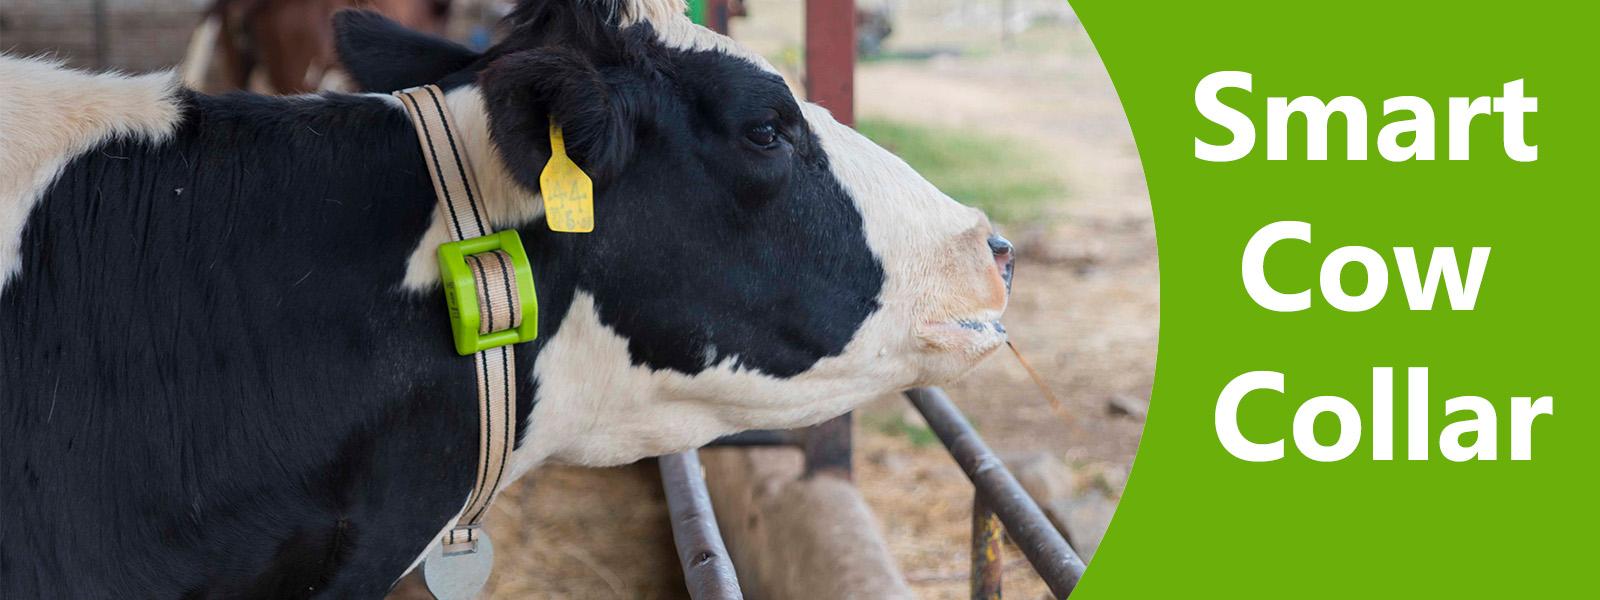 Smart Cow Collar